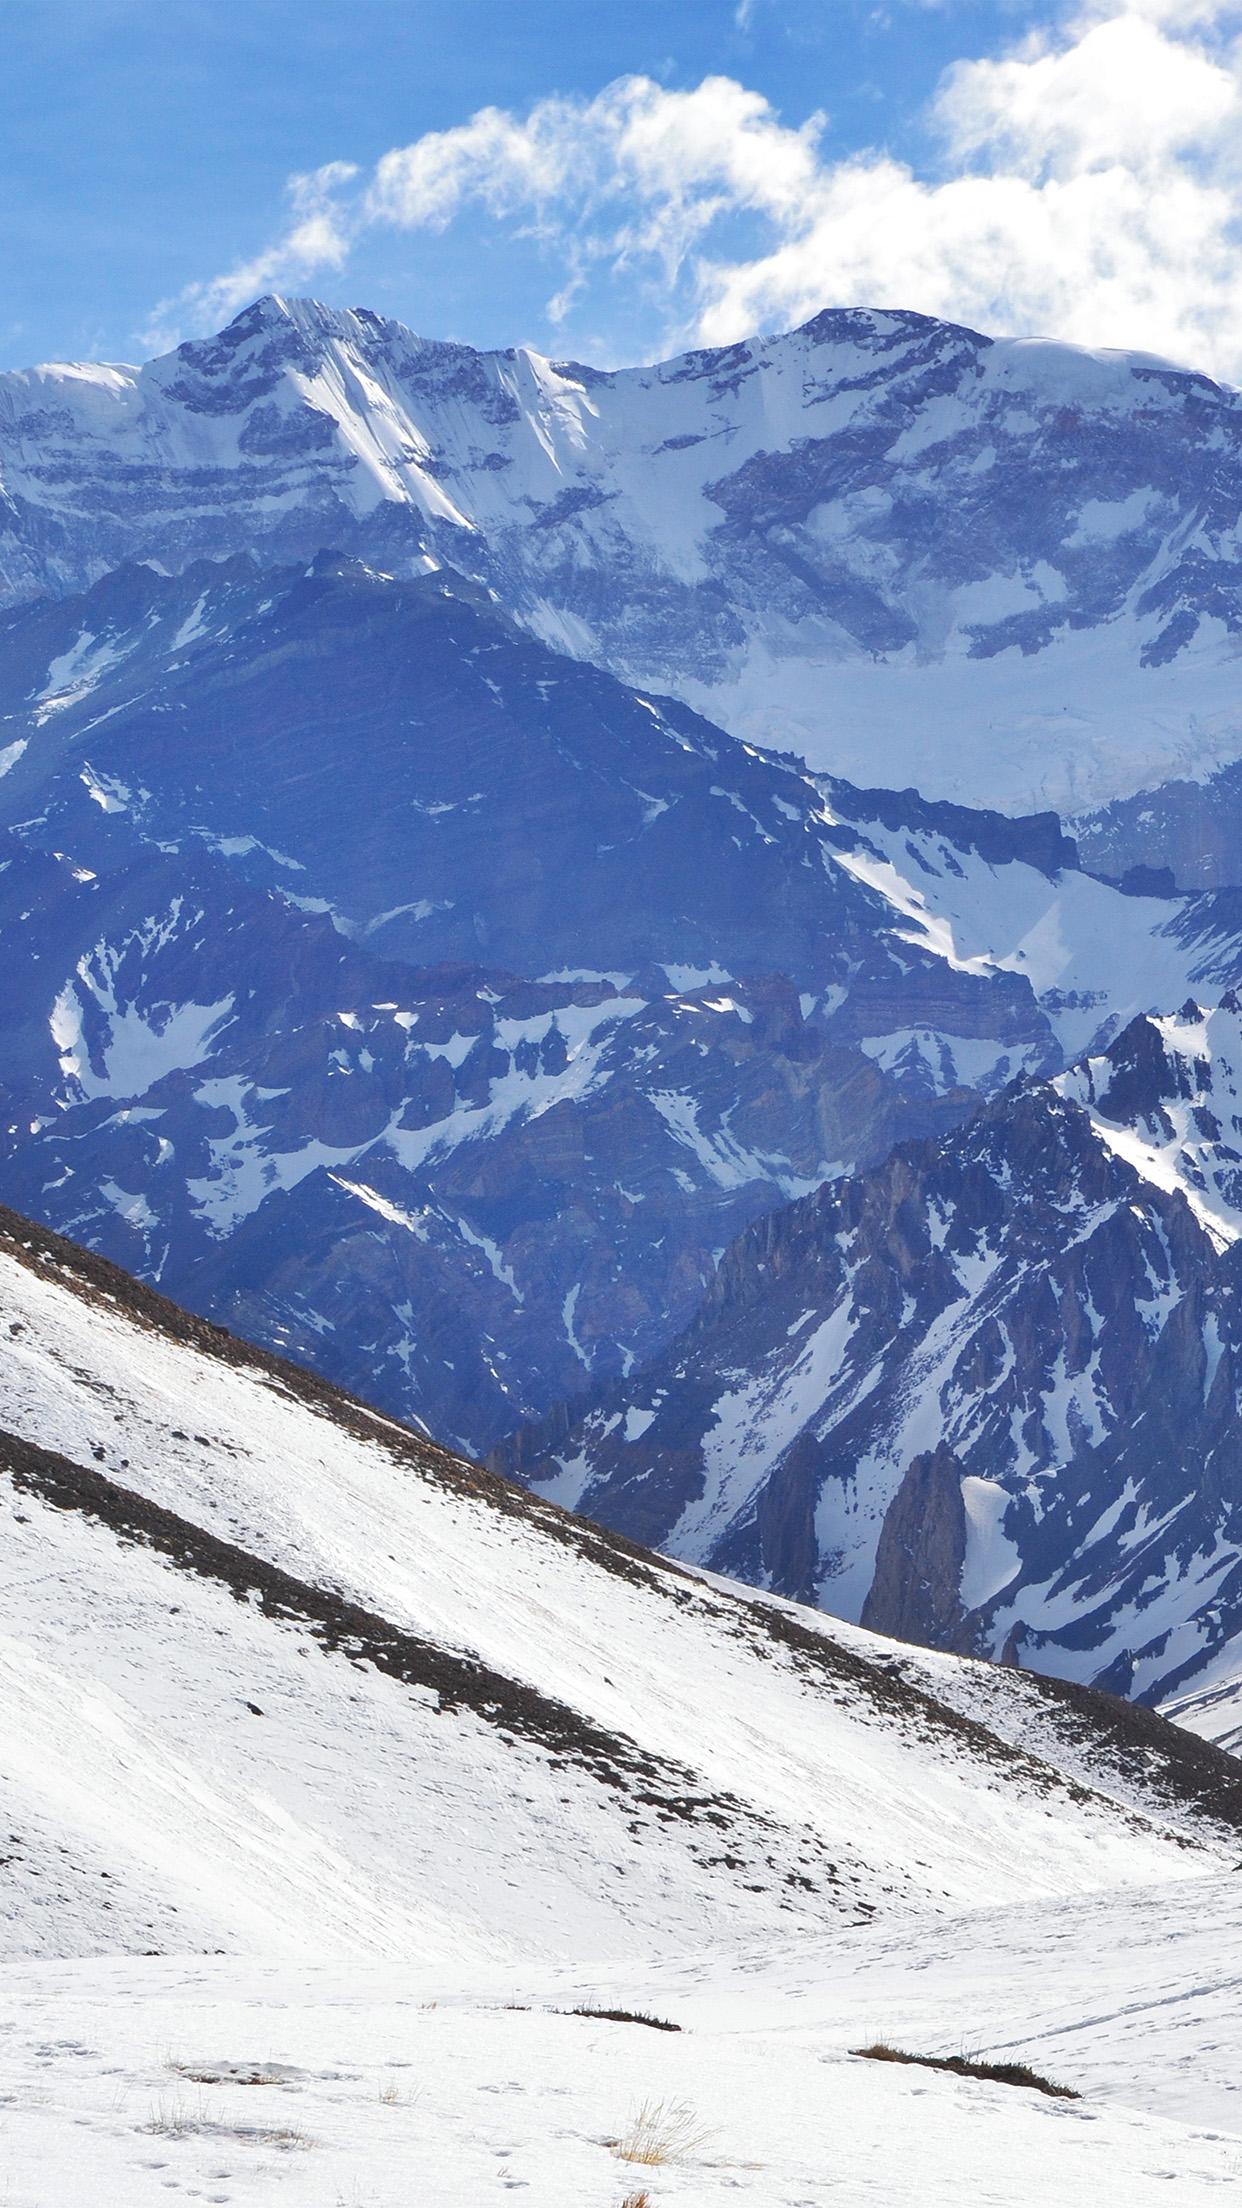 Great Wallpaper Mountain Art - Snow-Mountain-Art-Nature-Winter  Graphic_74421.jpg